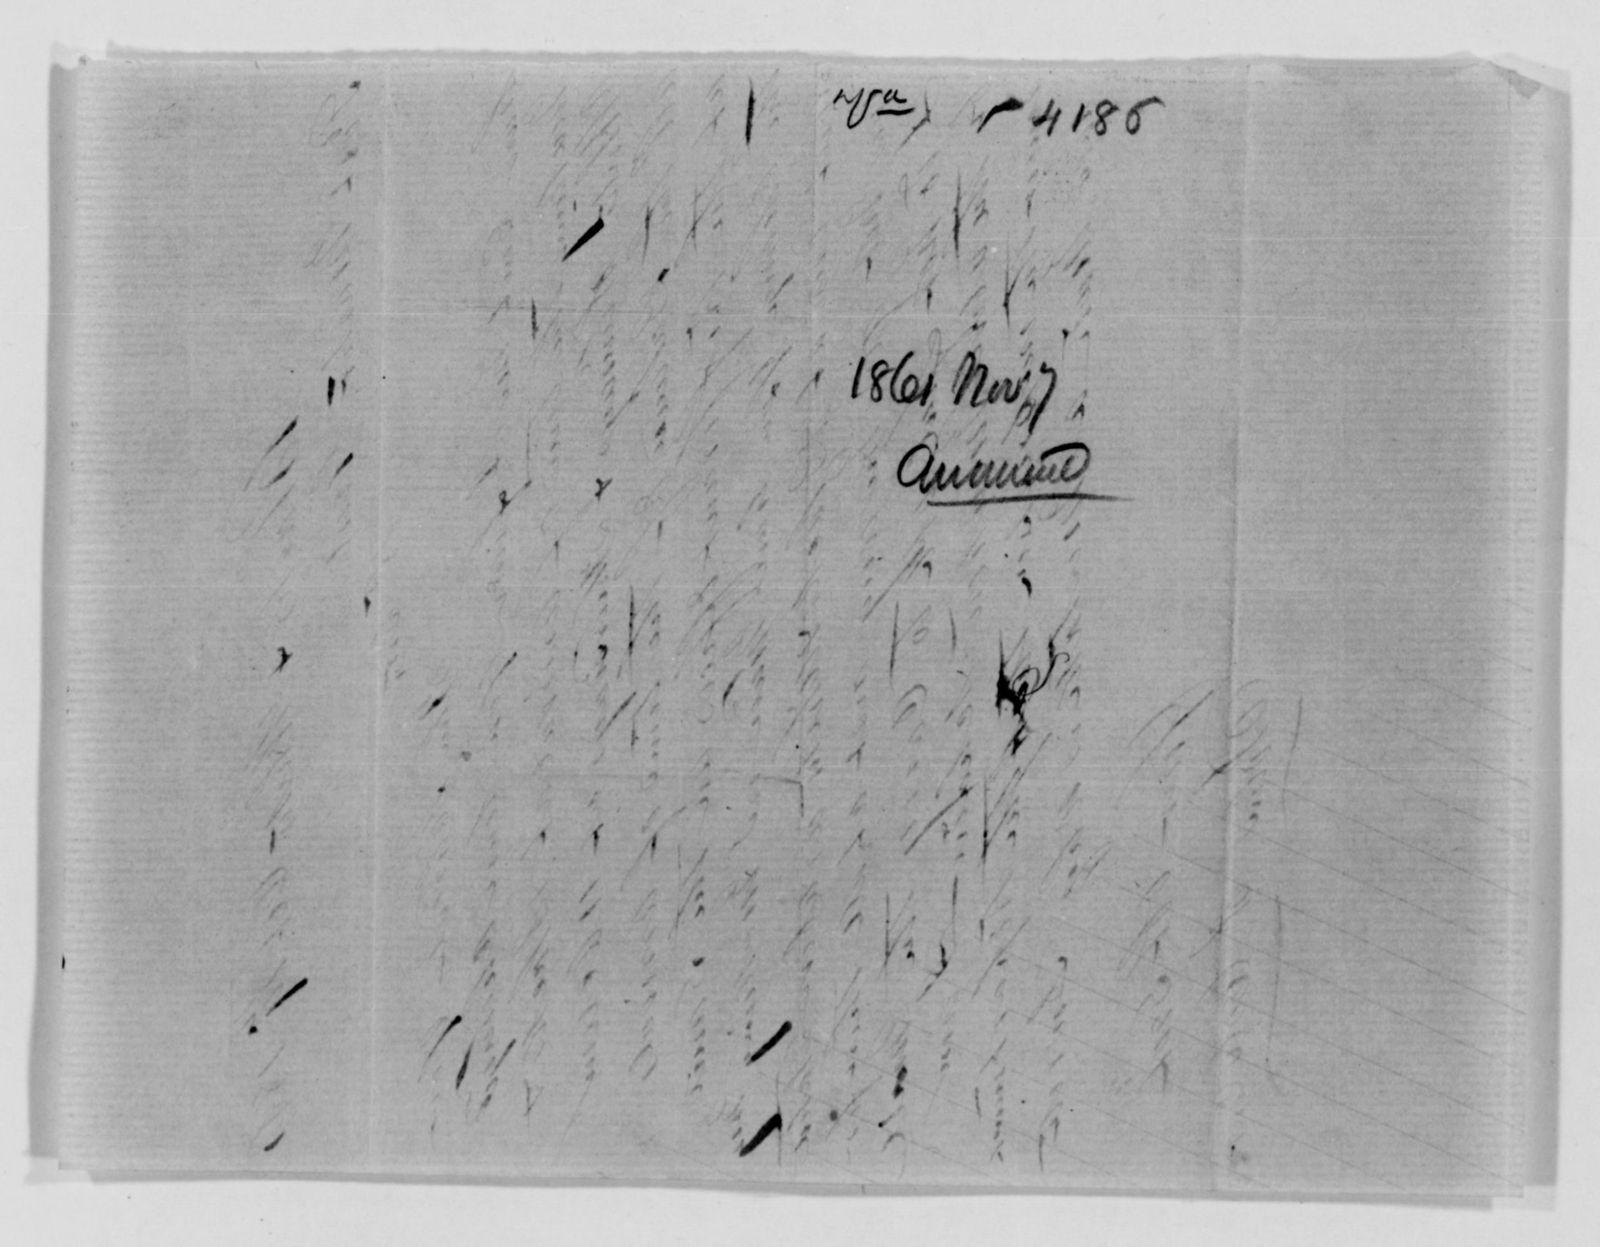 Confederate States of America records: Microfilm Reel 58